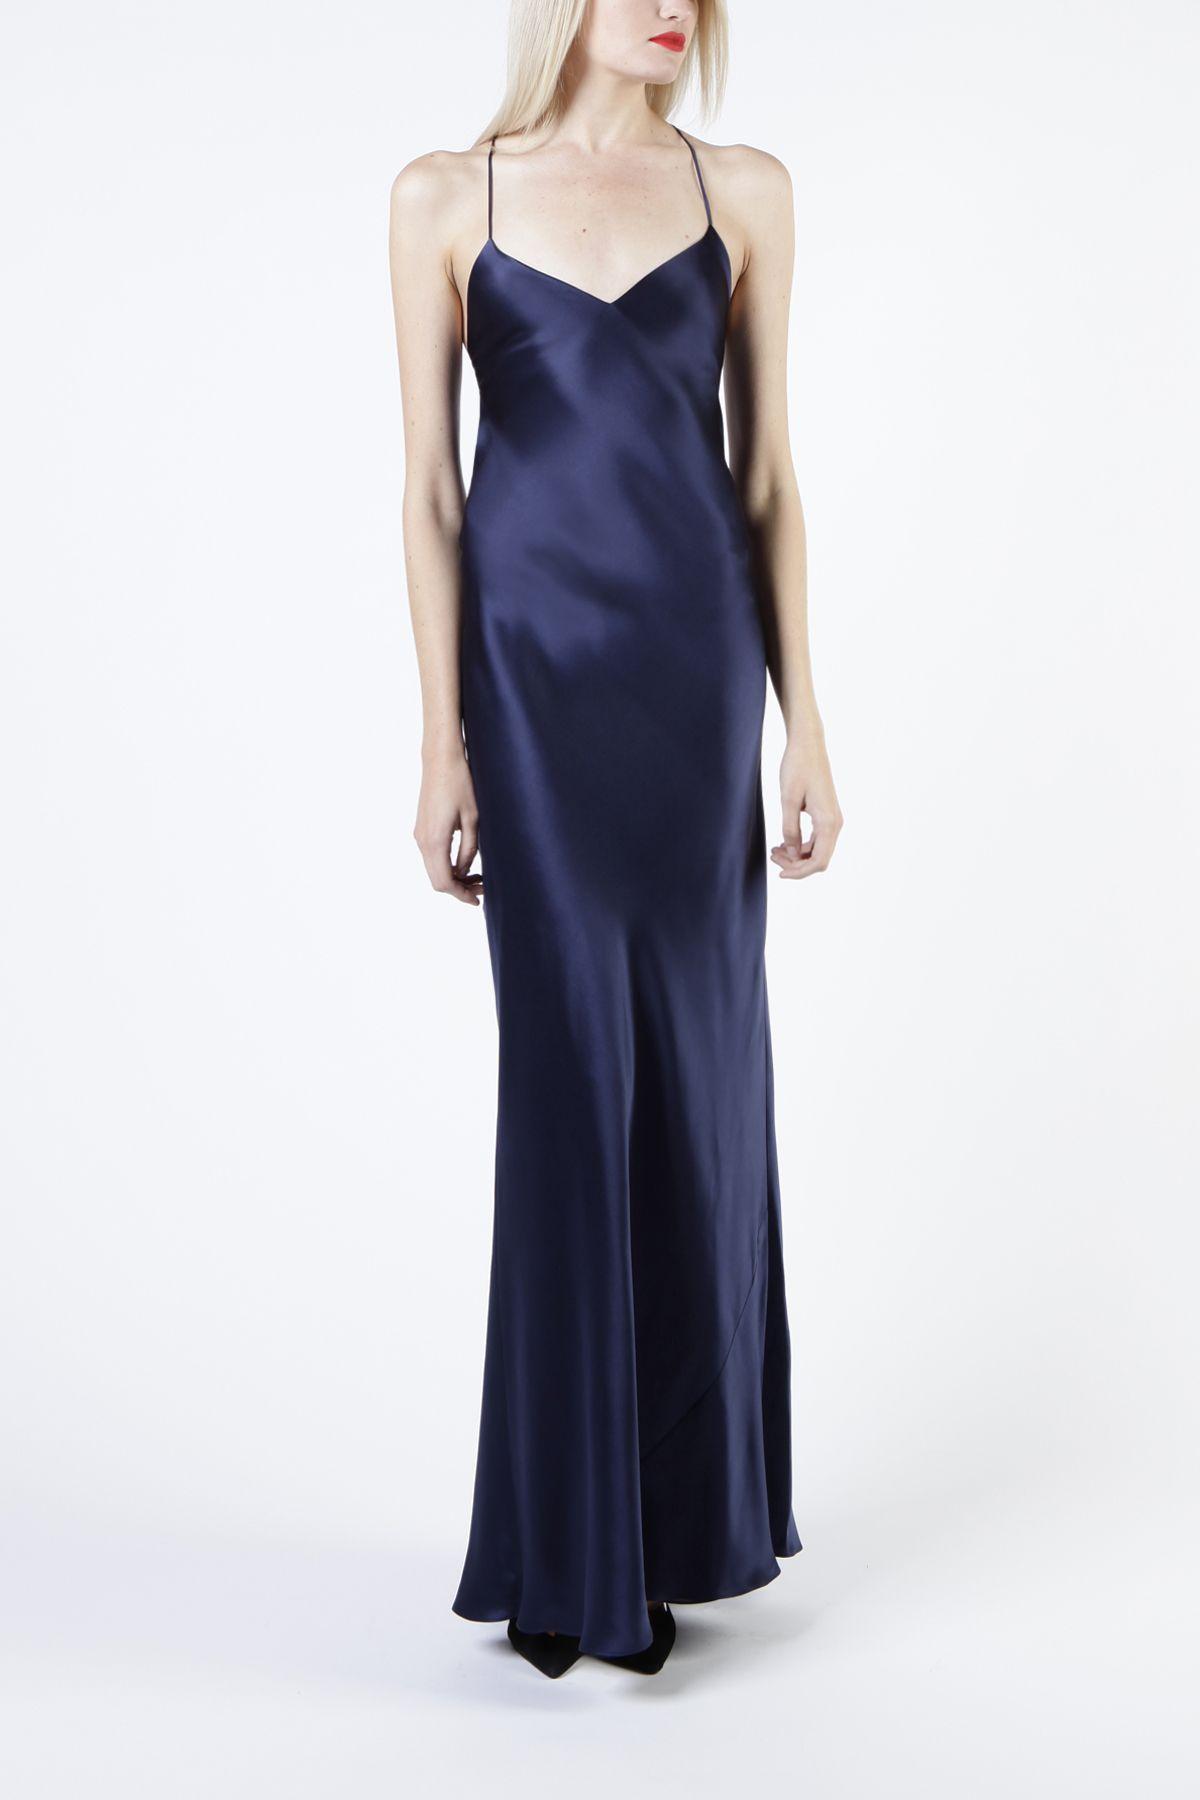 ca39094ae420d bias maxi slip dress - navy | Navy bridesmaid dresses in 2019 | Silk ...